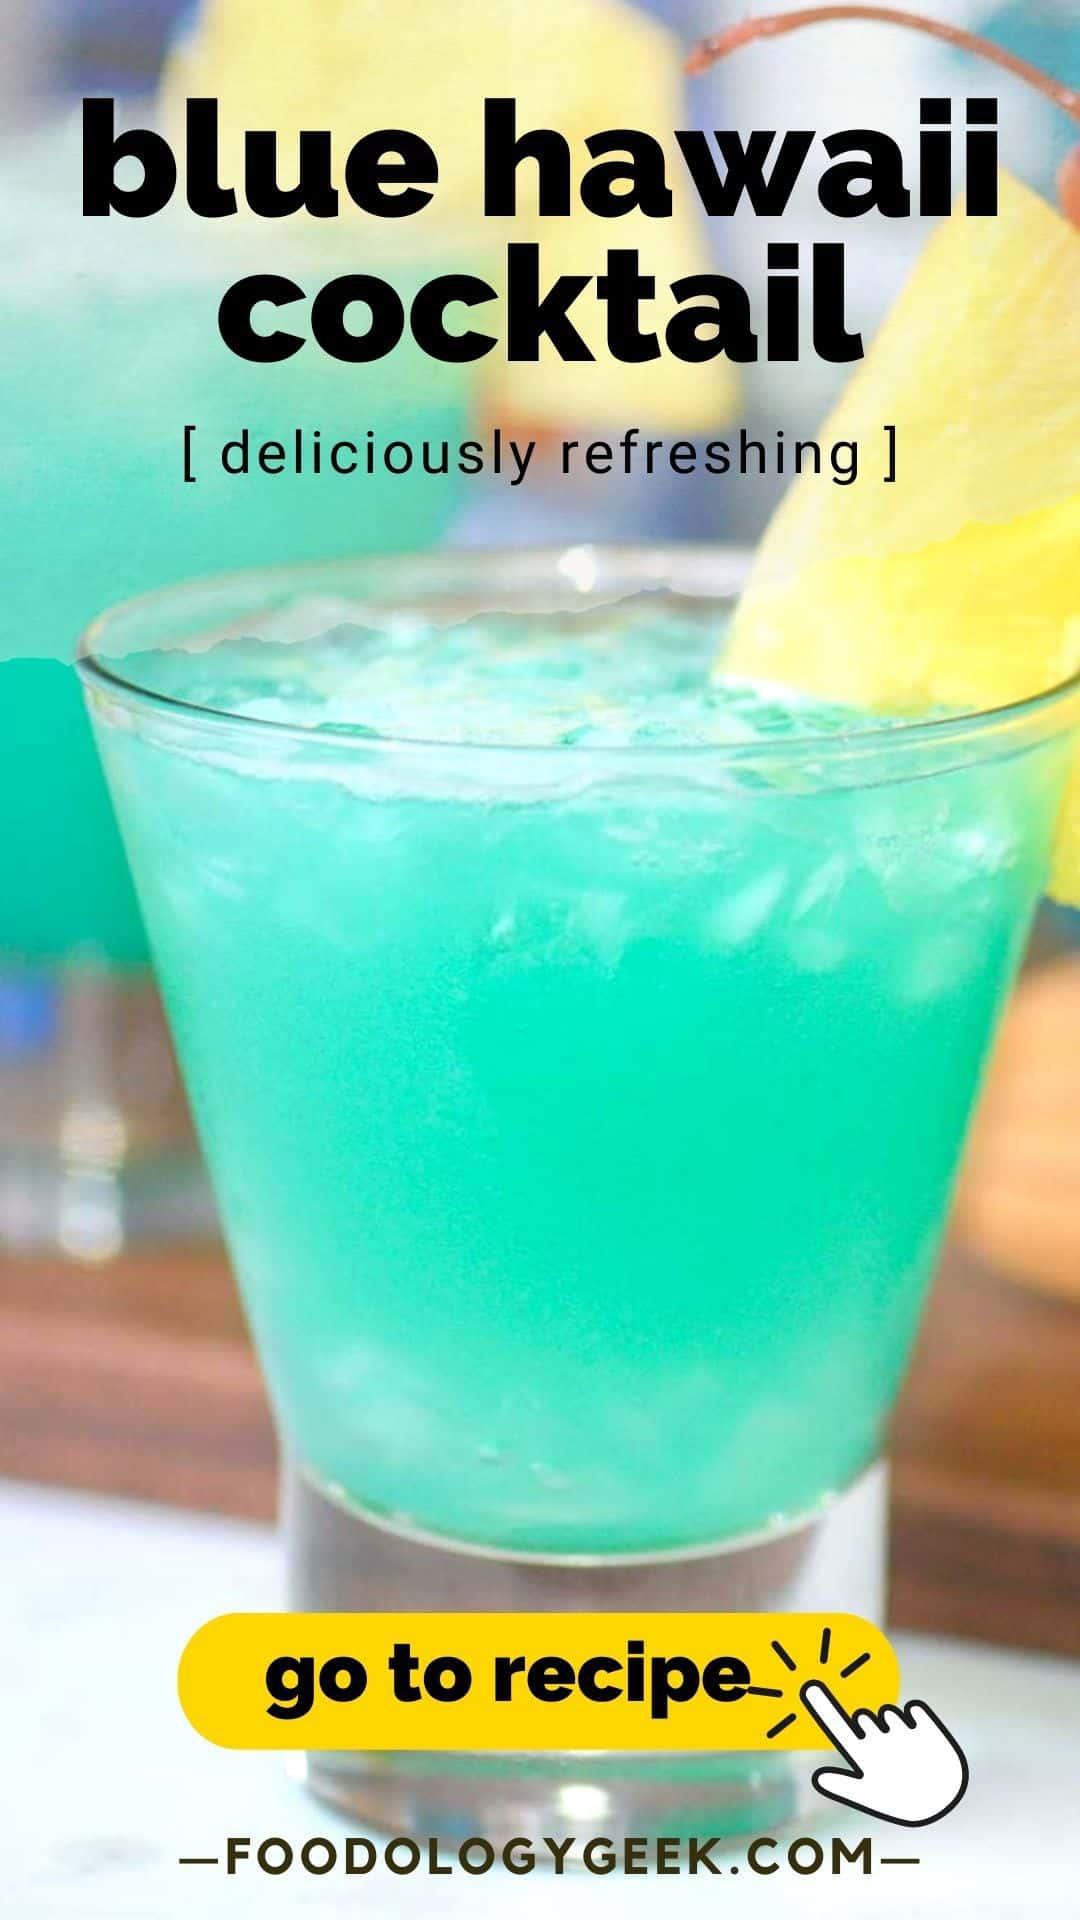 blue hawaii. cocktail pinterest image